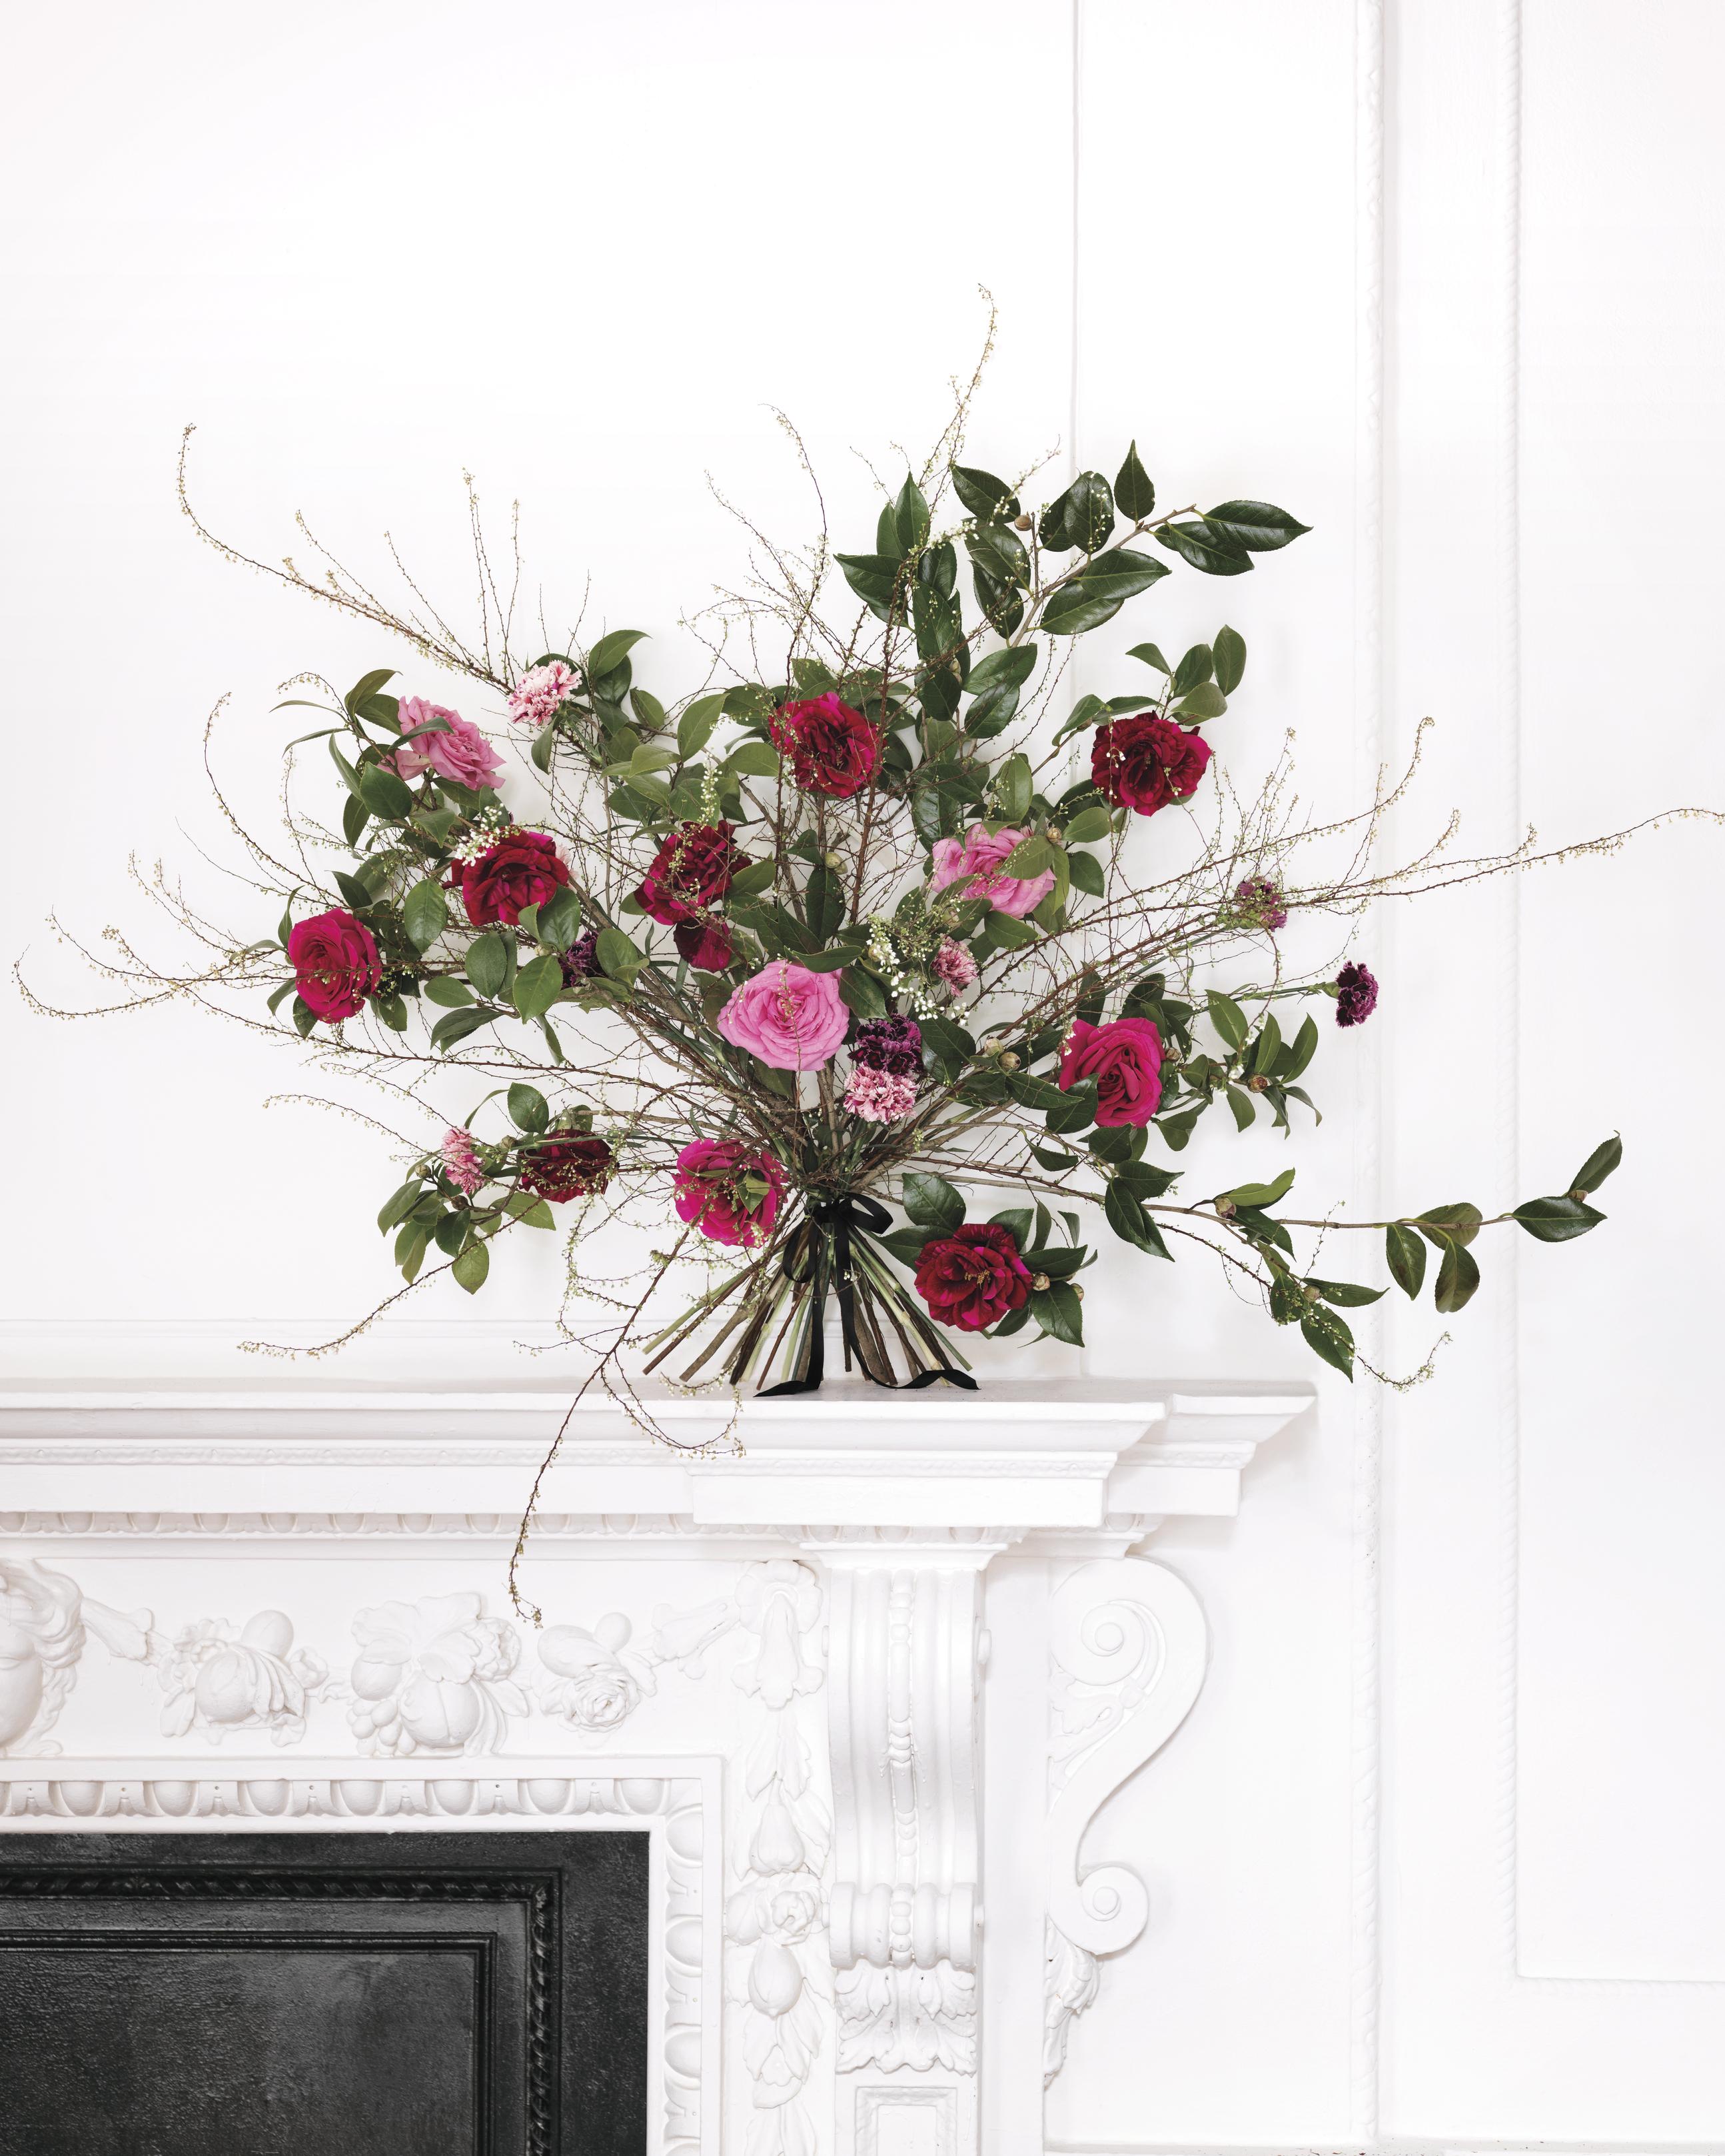 flowers-mantel-shot-1-0062-d111961.jpg